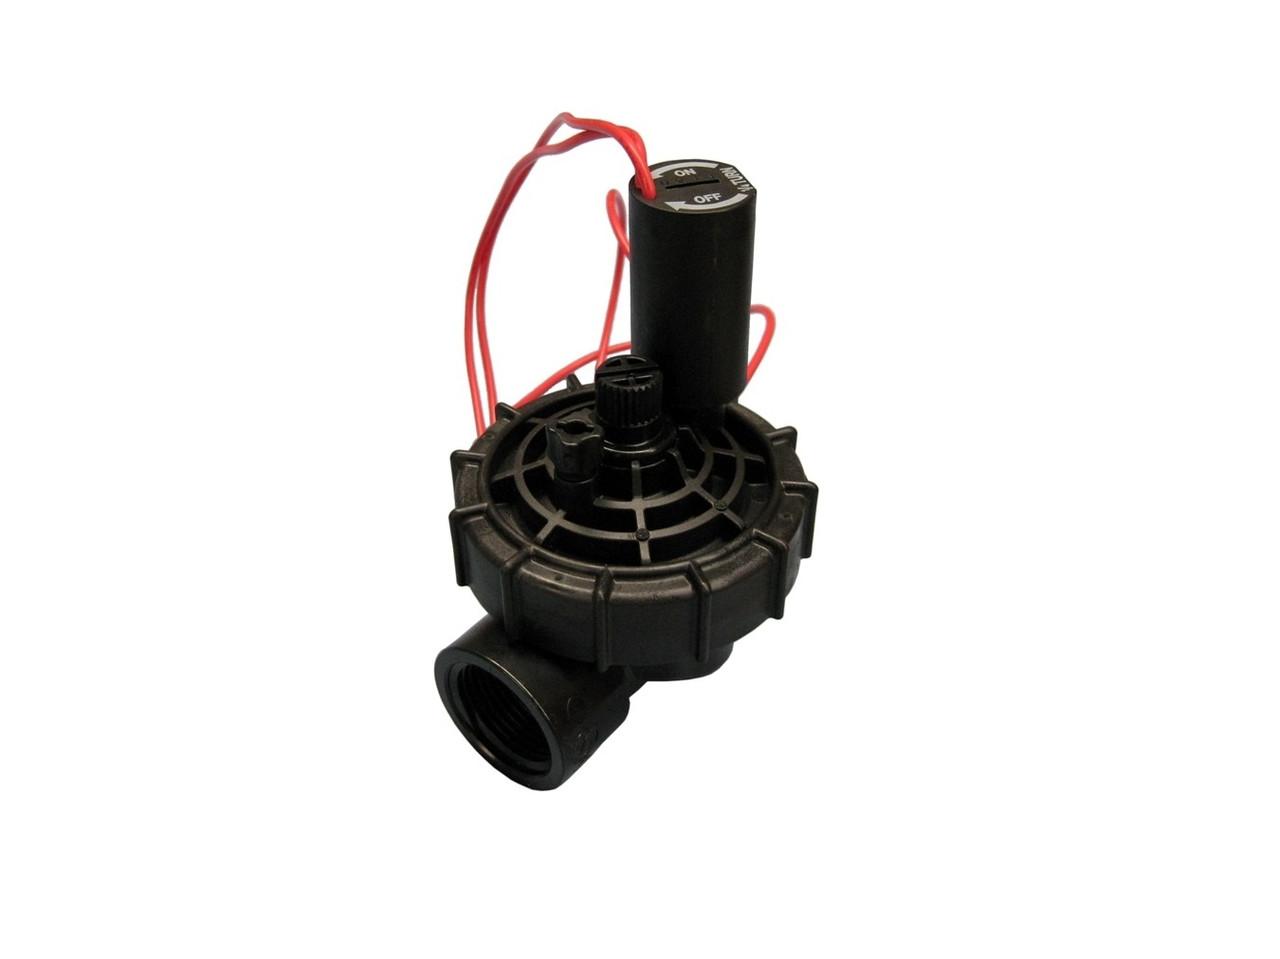 Клапан PGV JAR TOP  PGV-101JTGB сферический  с регулятором потока ВР П